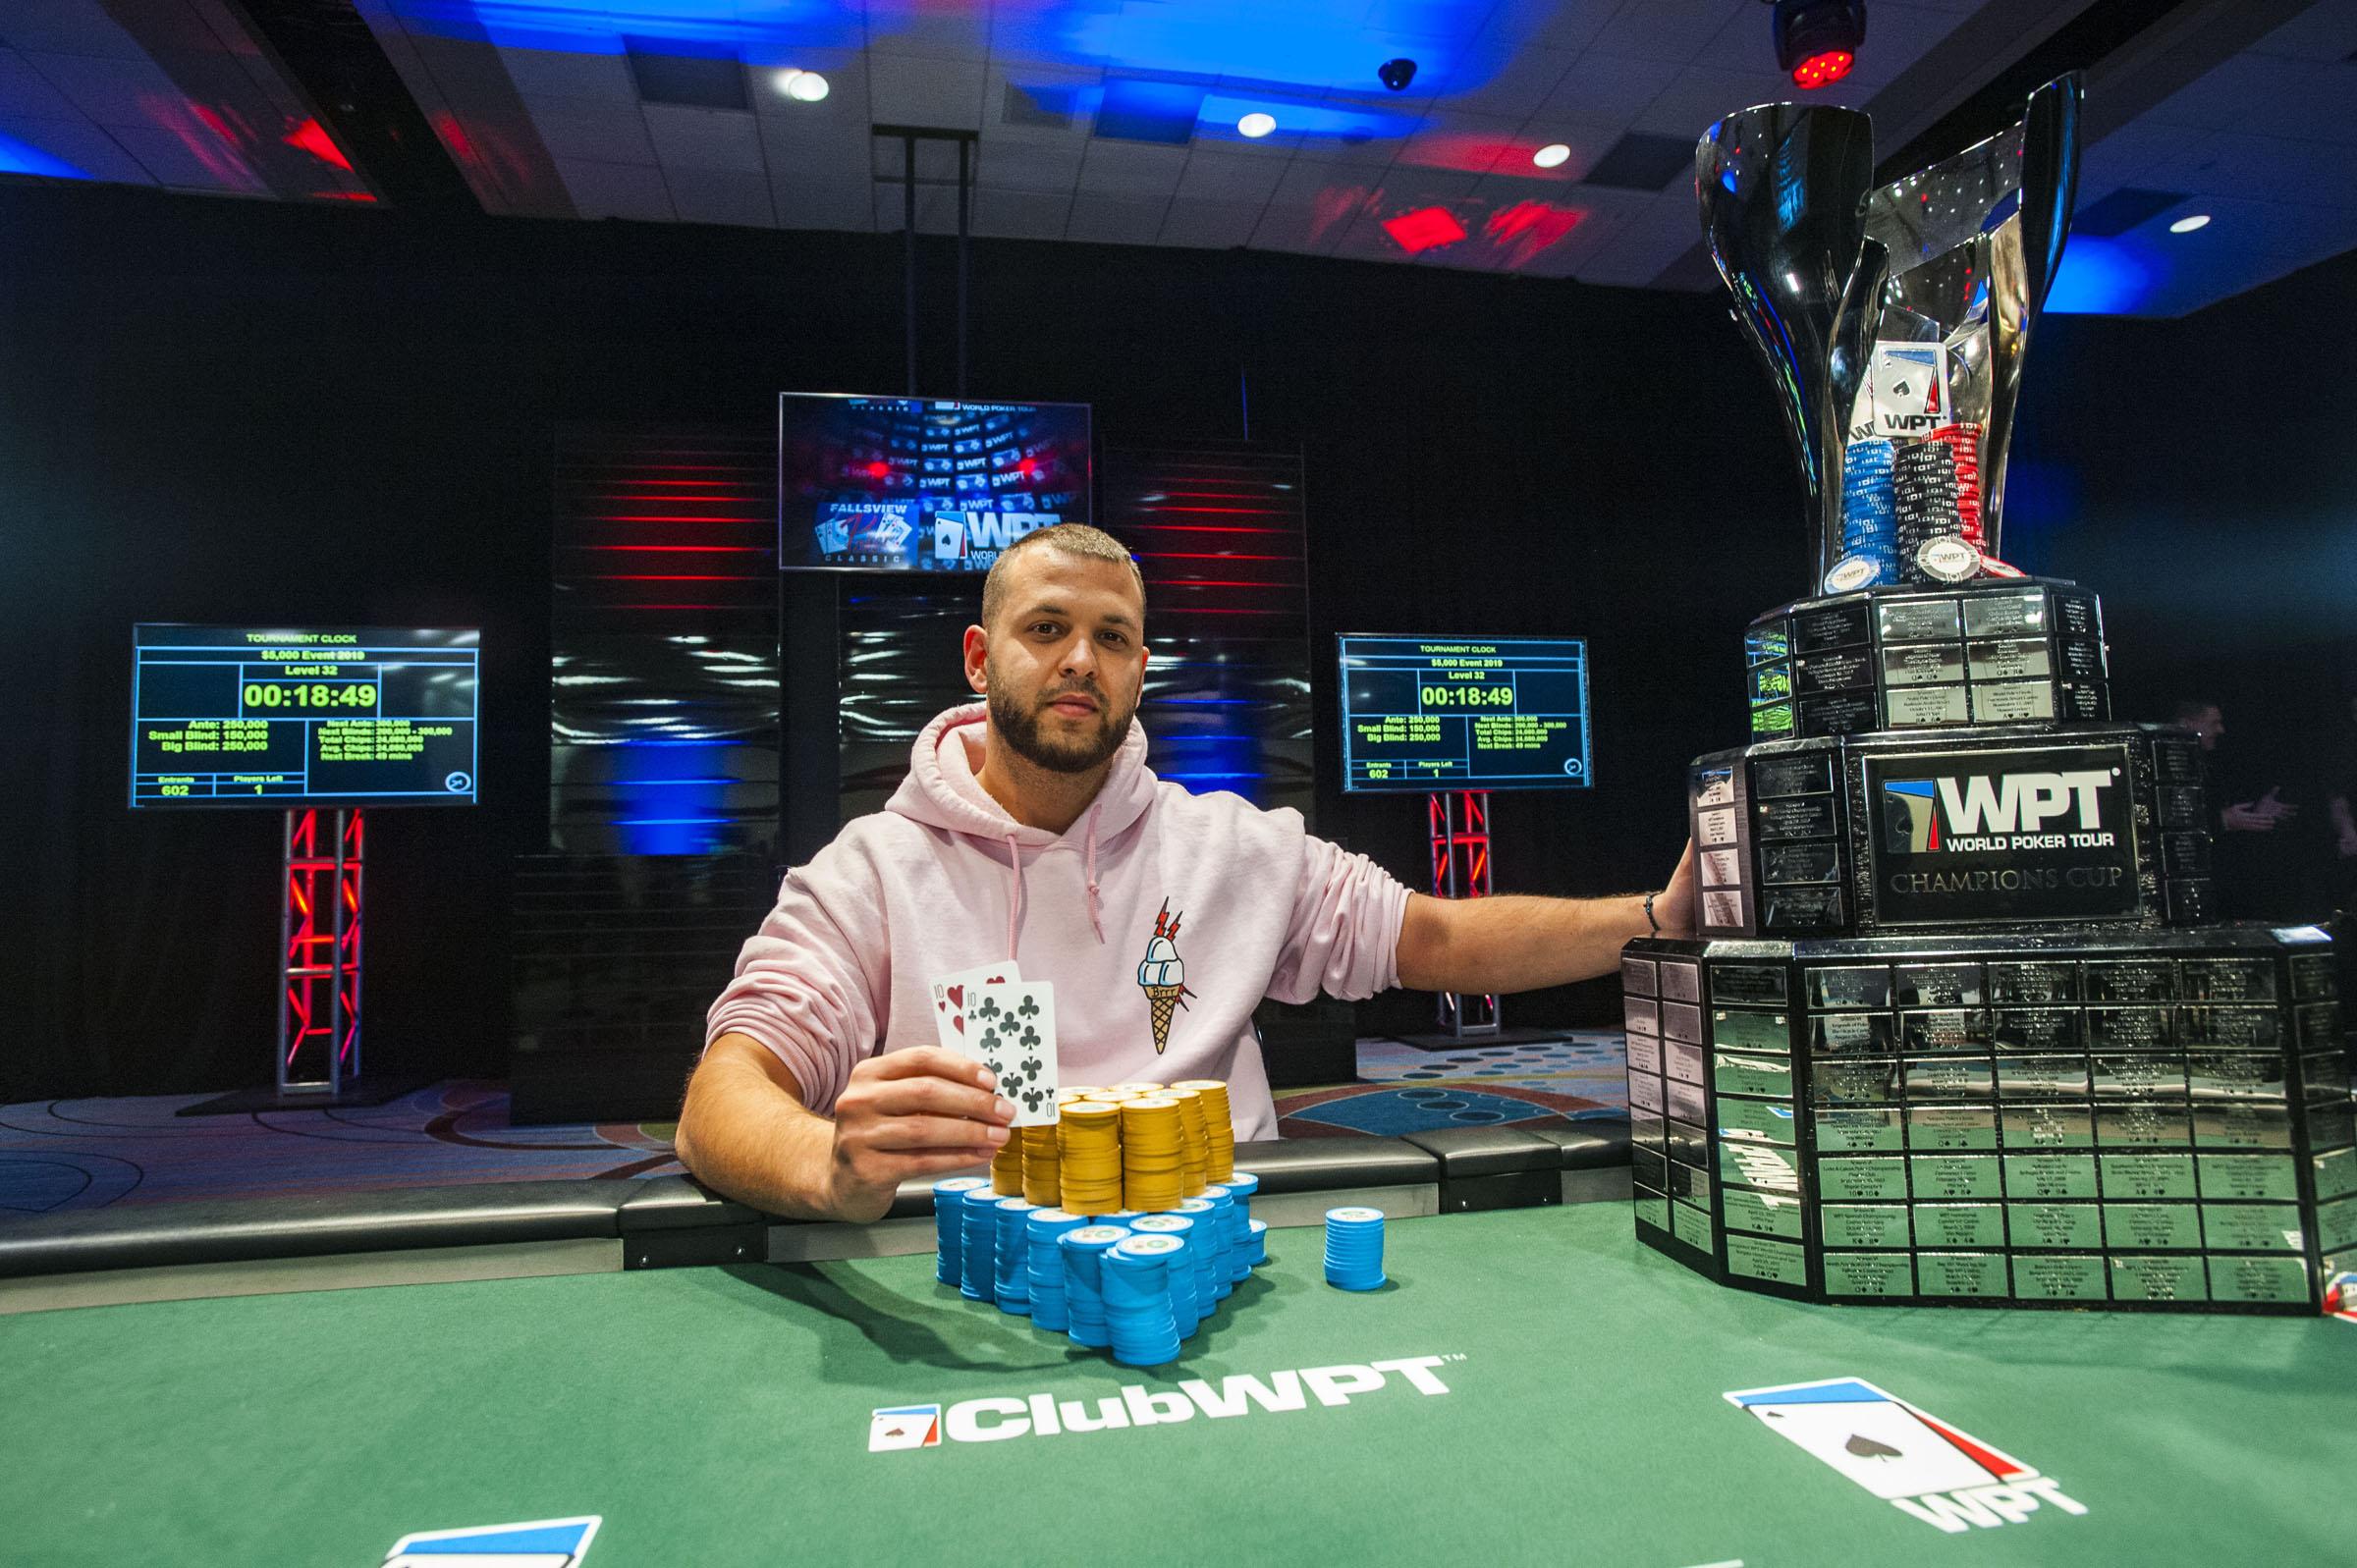 Casino niagara poker blinds betting betting tips uk racing naps